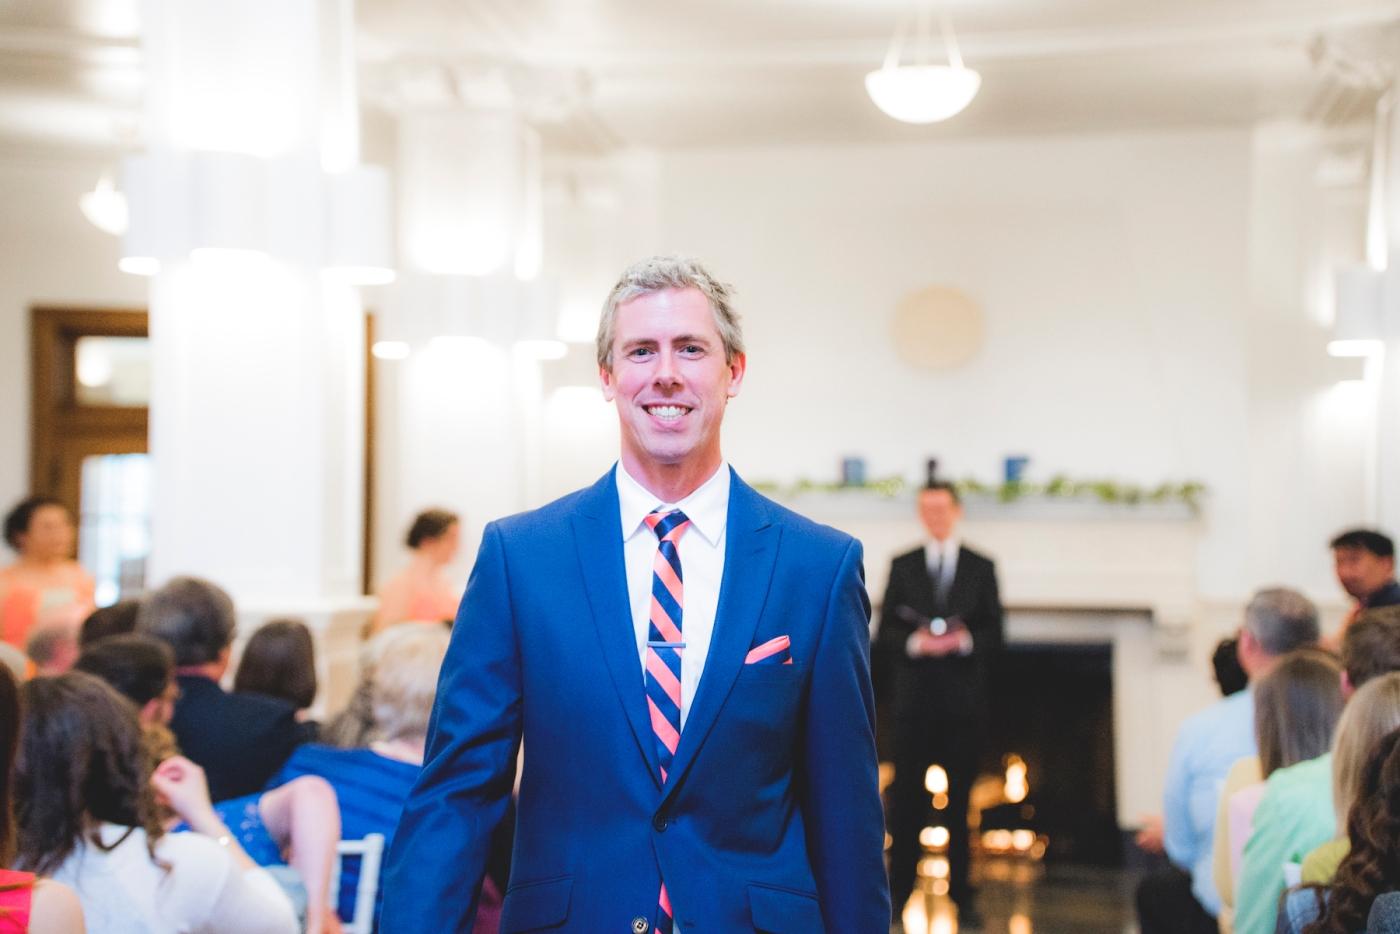 DSC_2745Everett_Wedding_Ballroom_Jane_Speleers_photography_Rachel_and_Edmund_Ceremony_2017